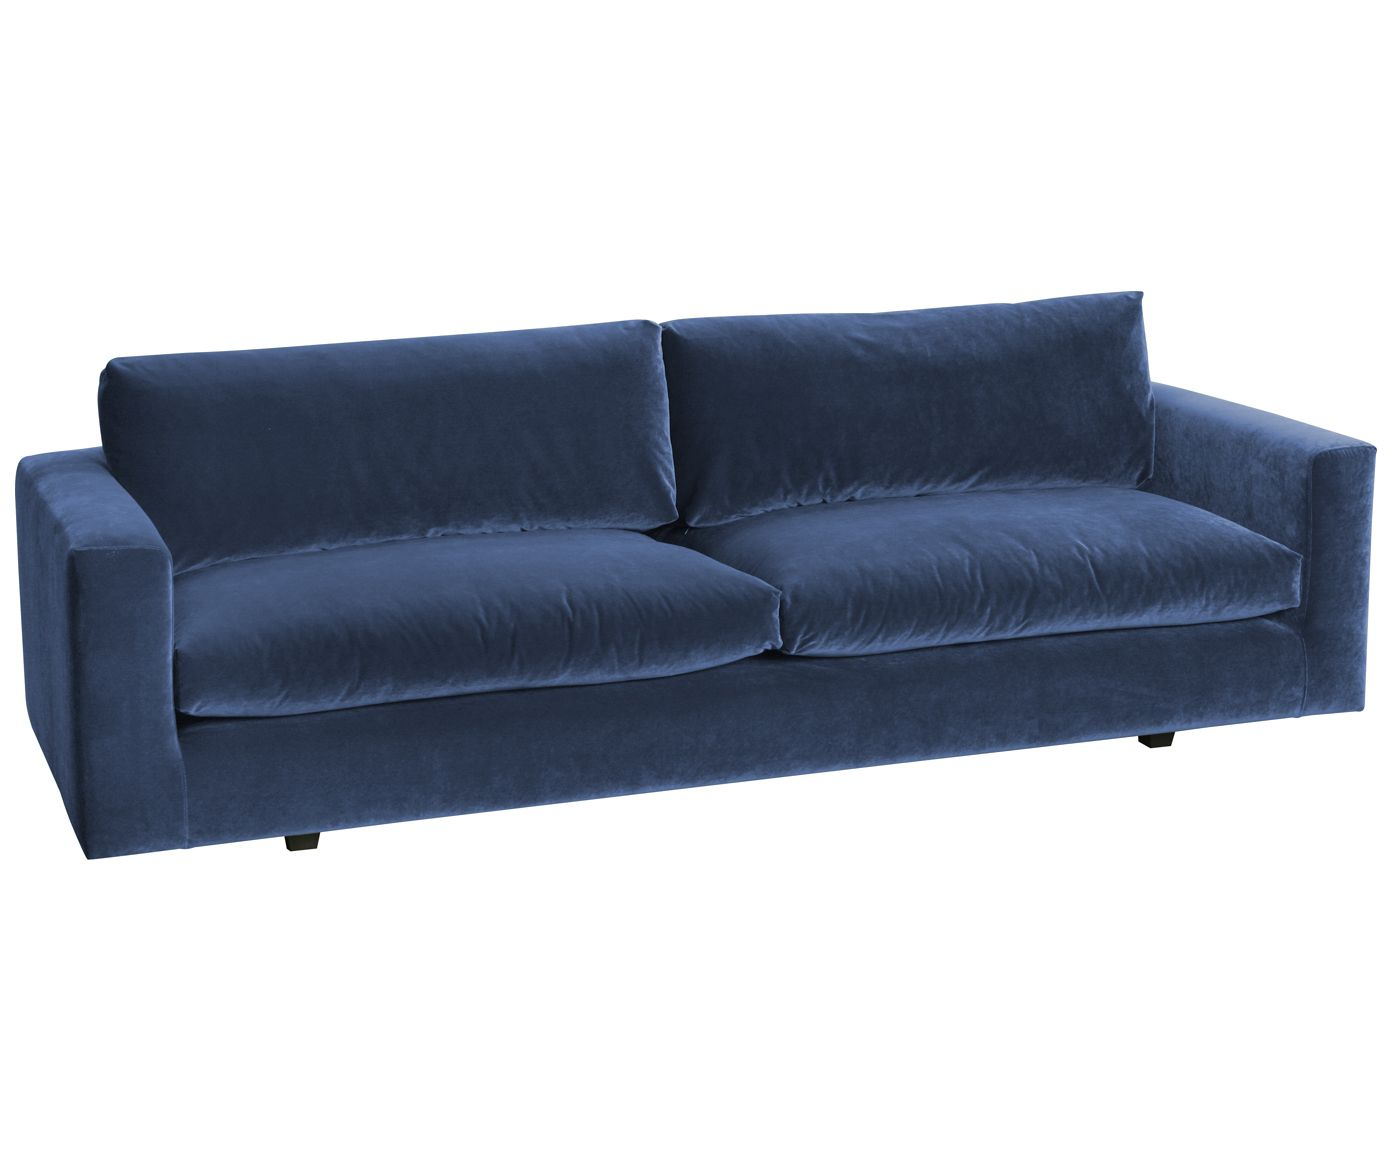 Samt sofa  Samt-Sofa Balmira (3-Sitzer)